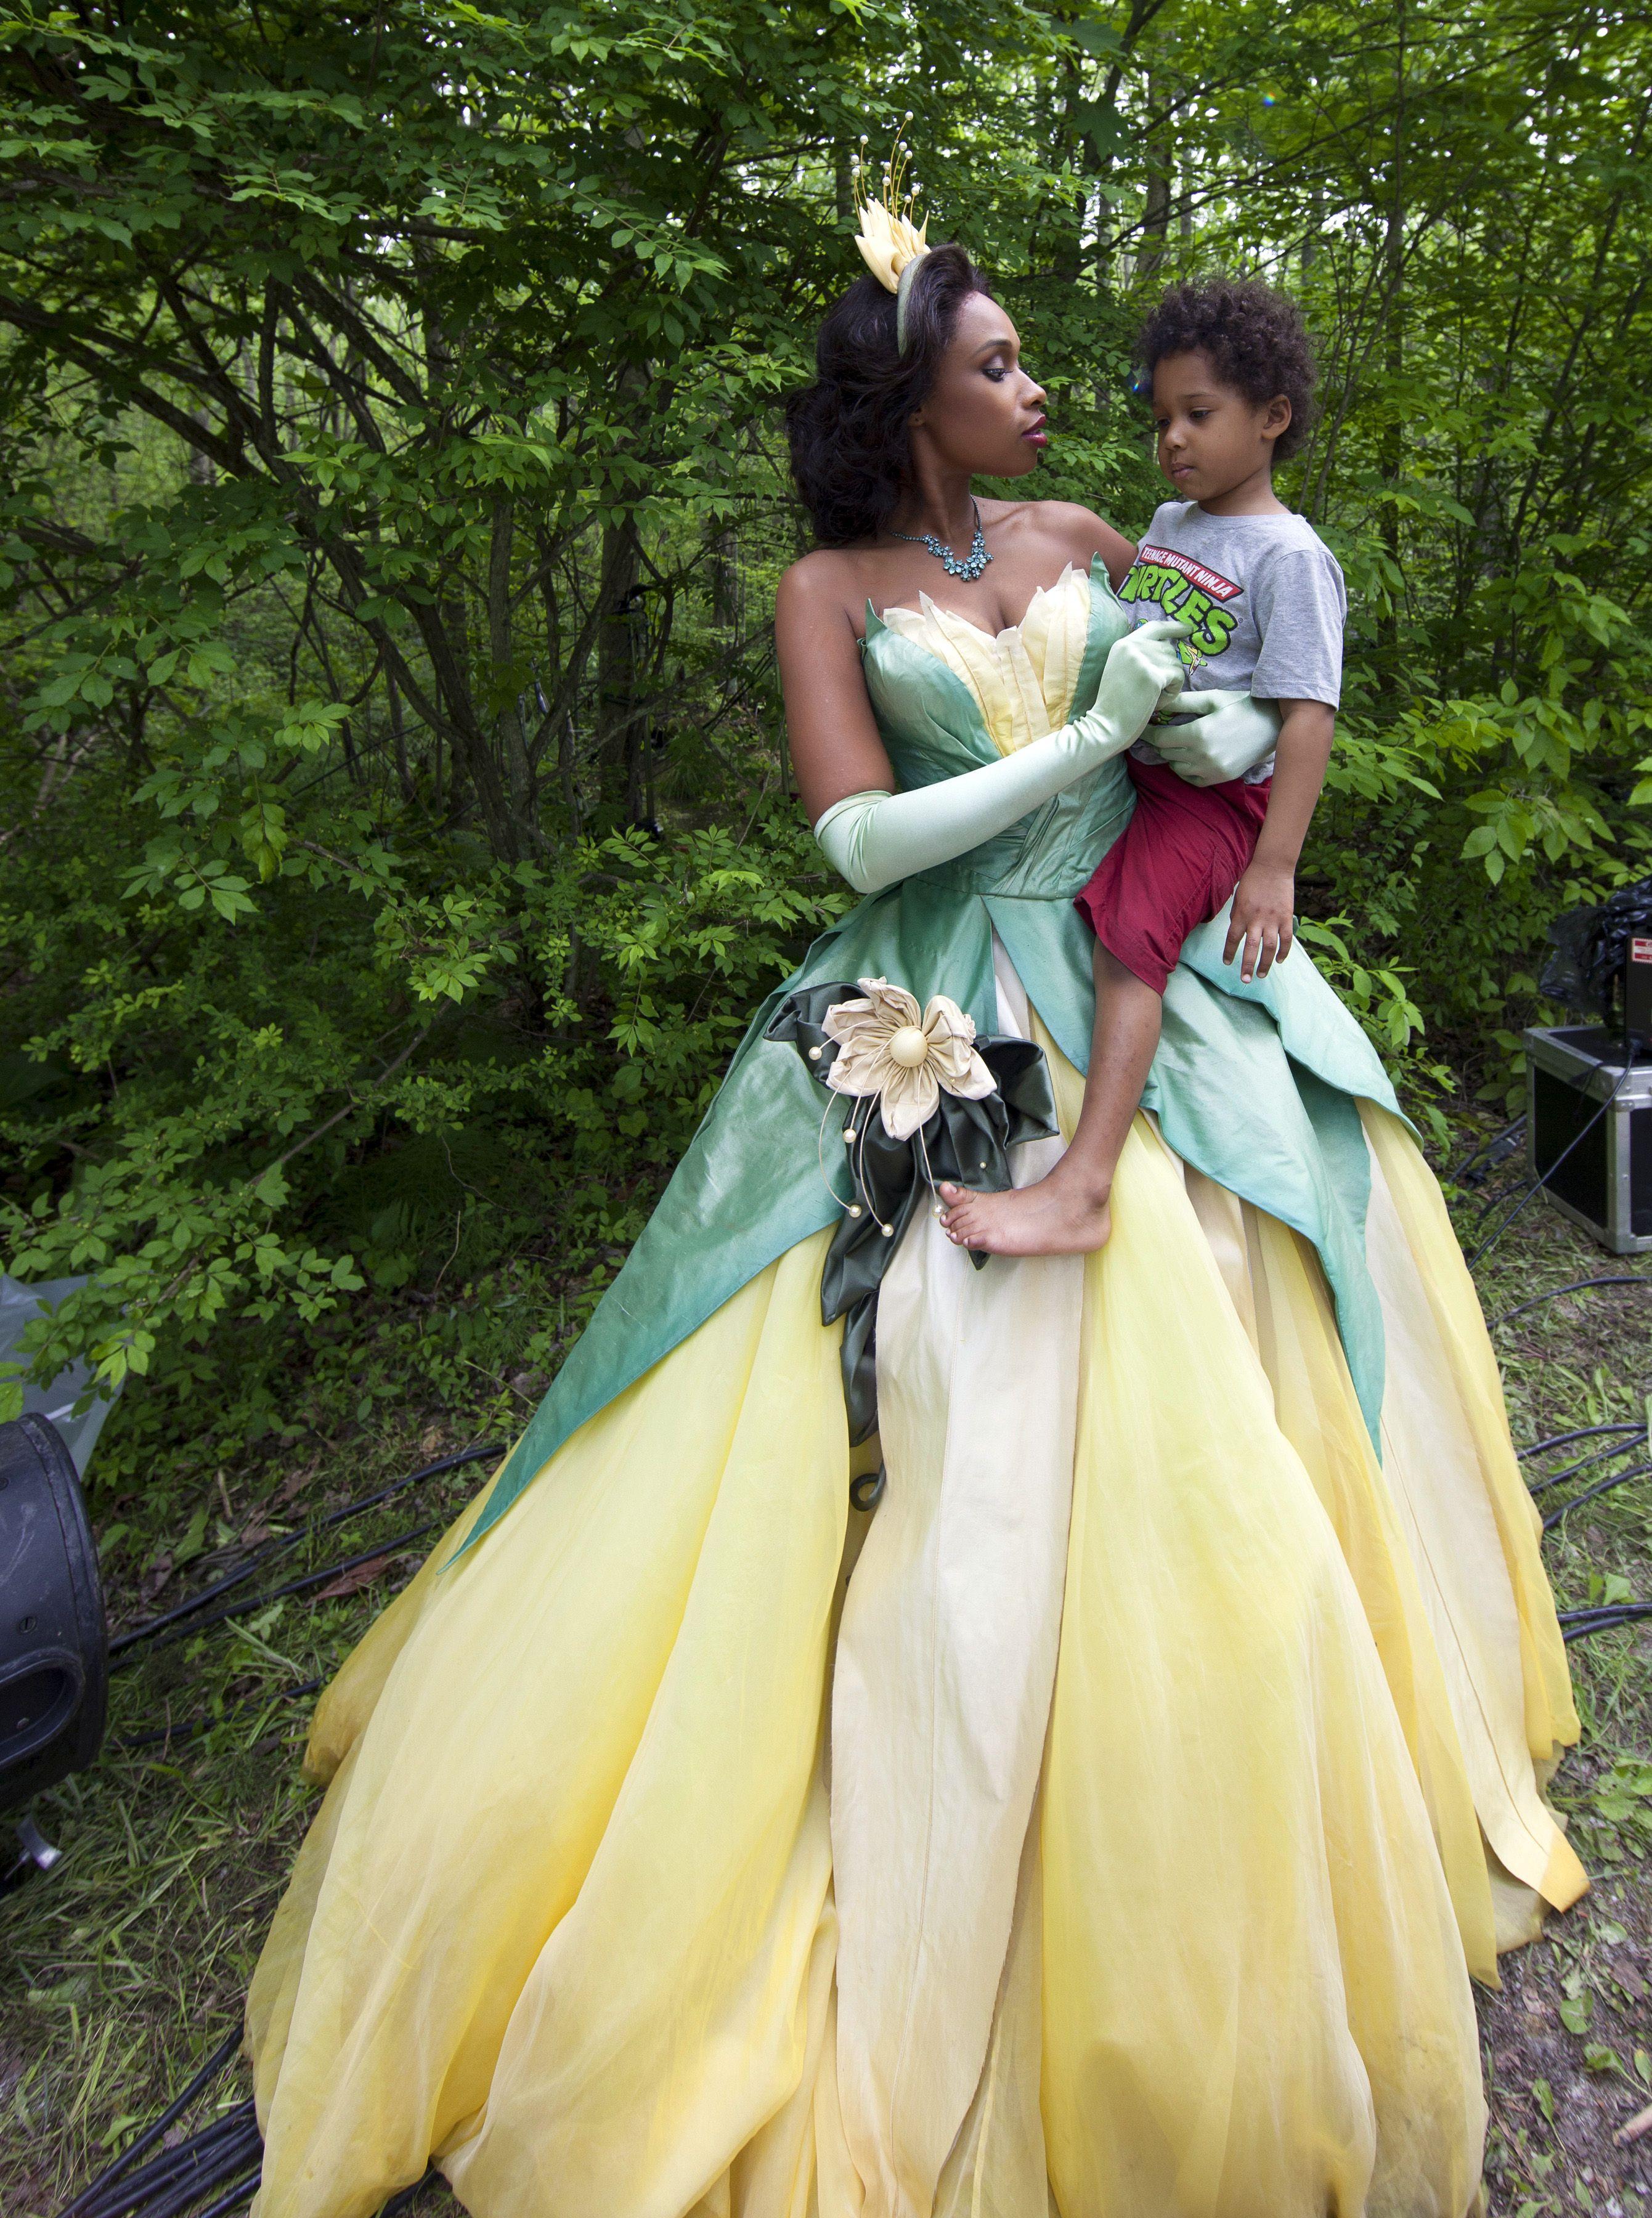 AWW Jennifer Hudsons Son Poses With Mommy Tiana DisneyDisney